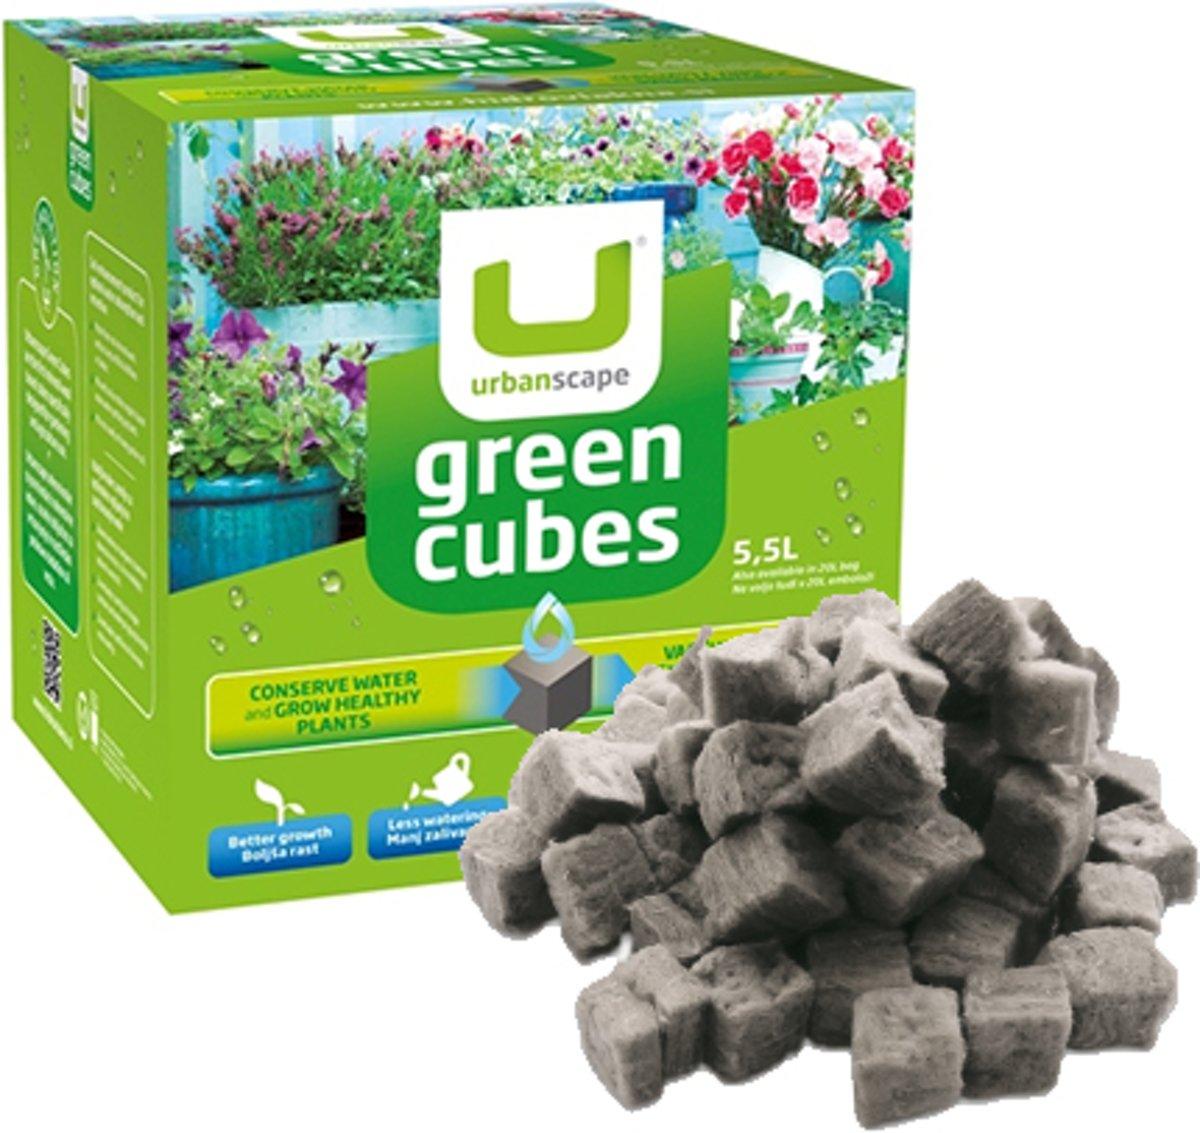 Urbanscape Greencubes Biologische Plantenvoeding - Lavameel - 600g